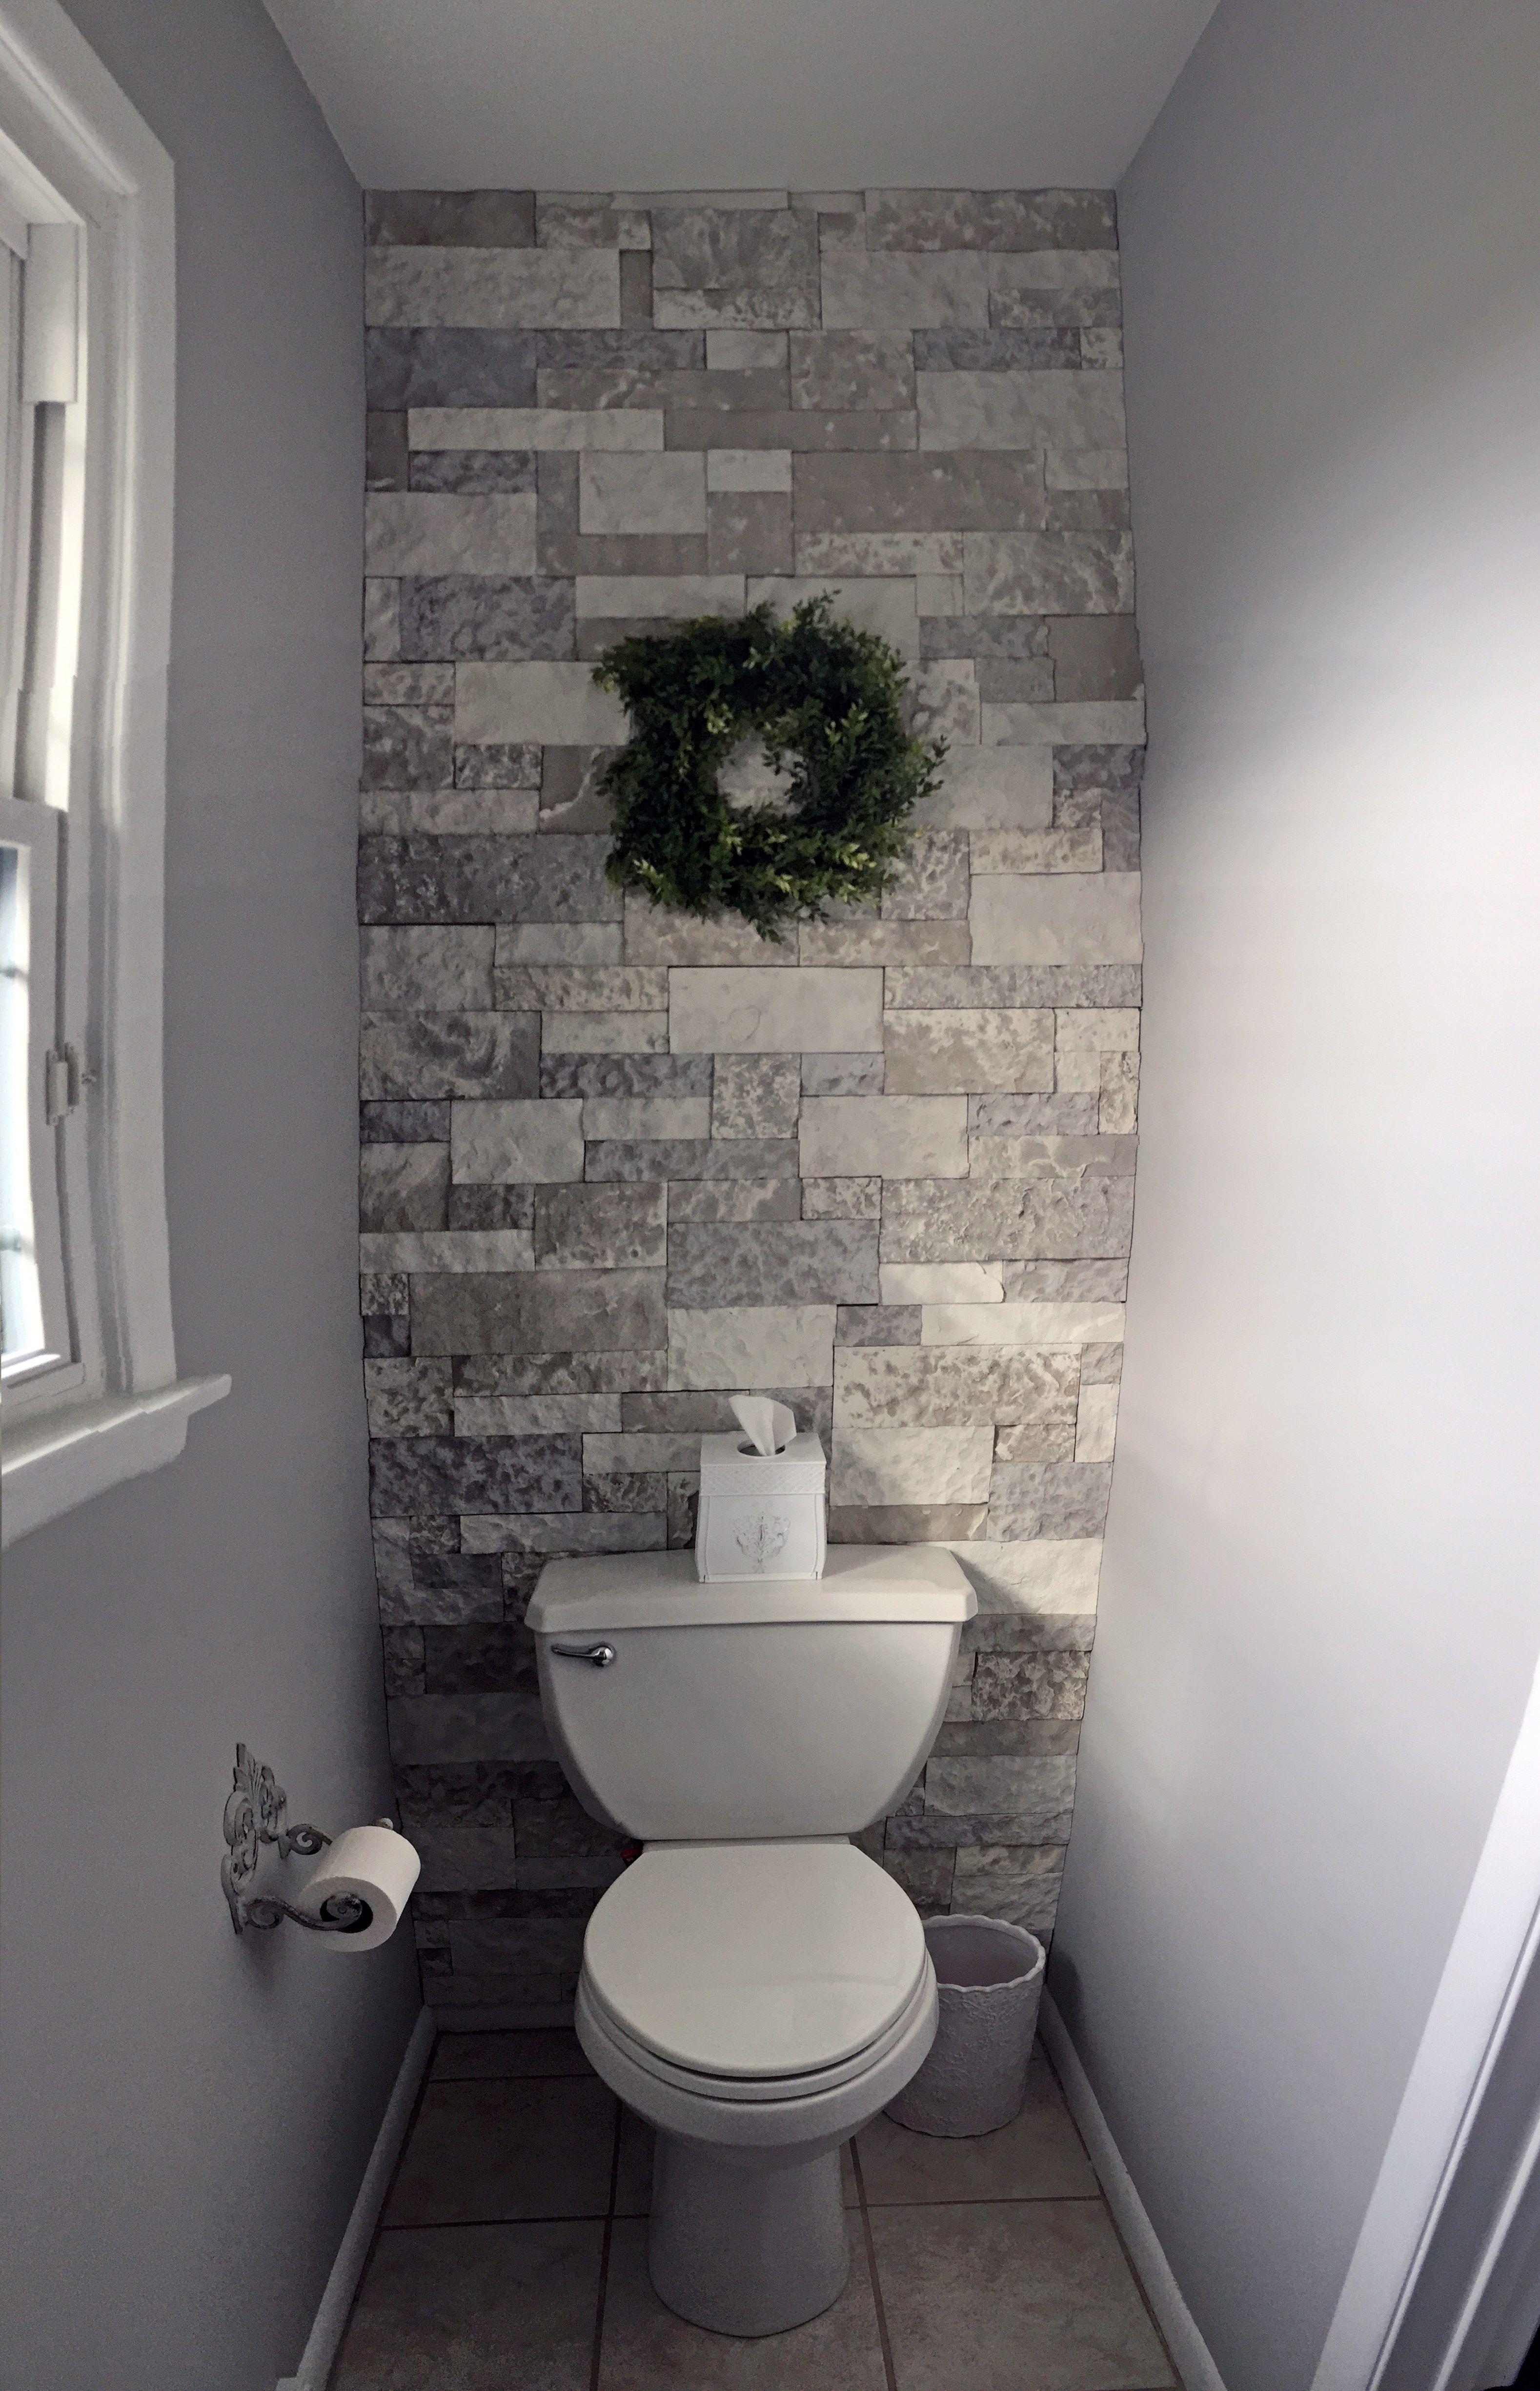 Amazing Airstone Accent Wall Bathroom - 9fbe702fa8c3745744ab3df8e79b66da  Graphic_671084.jpg